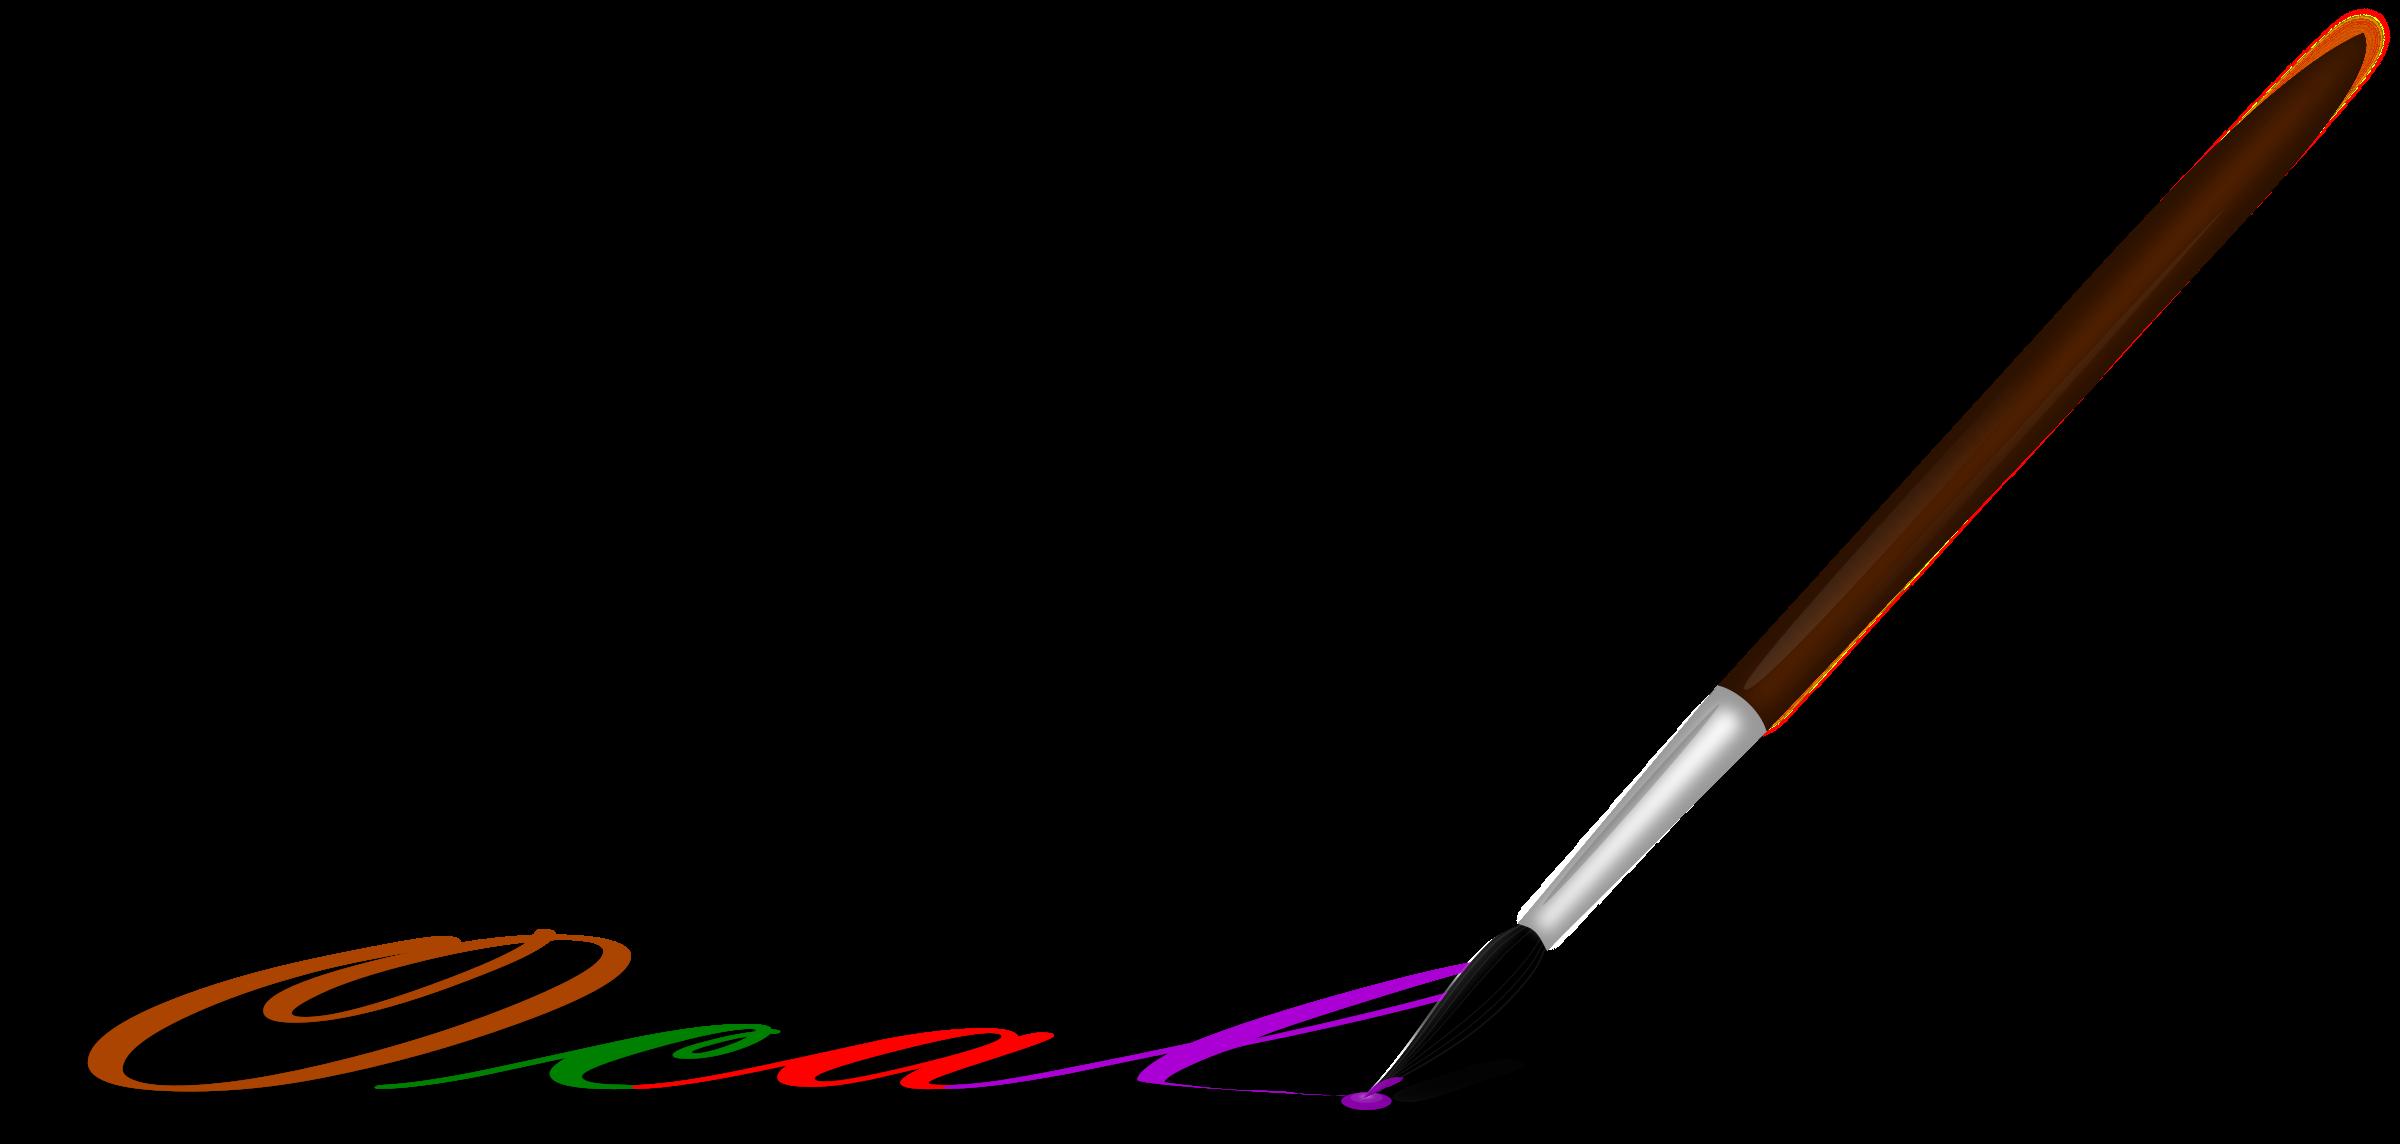 image transparent download Brushing clipart artistic. Painting brush big image.